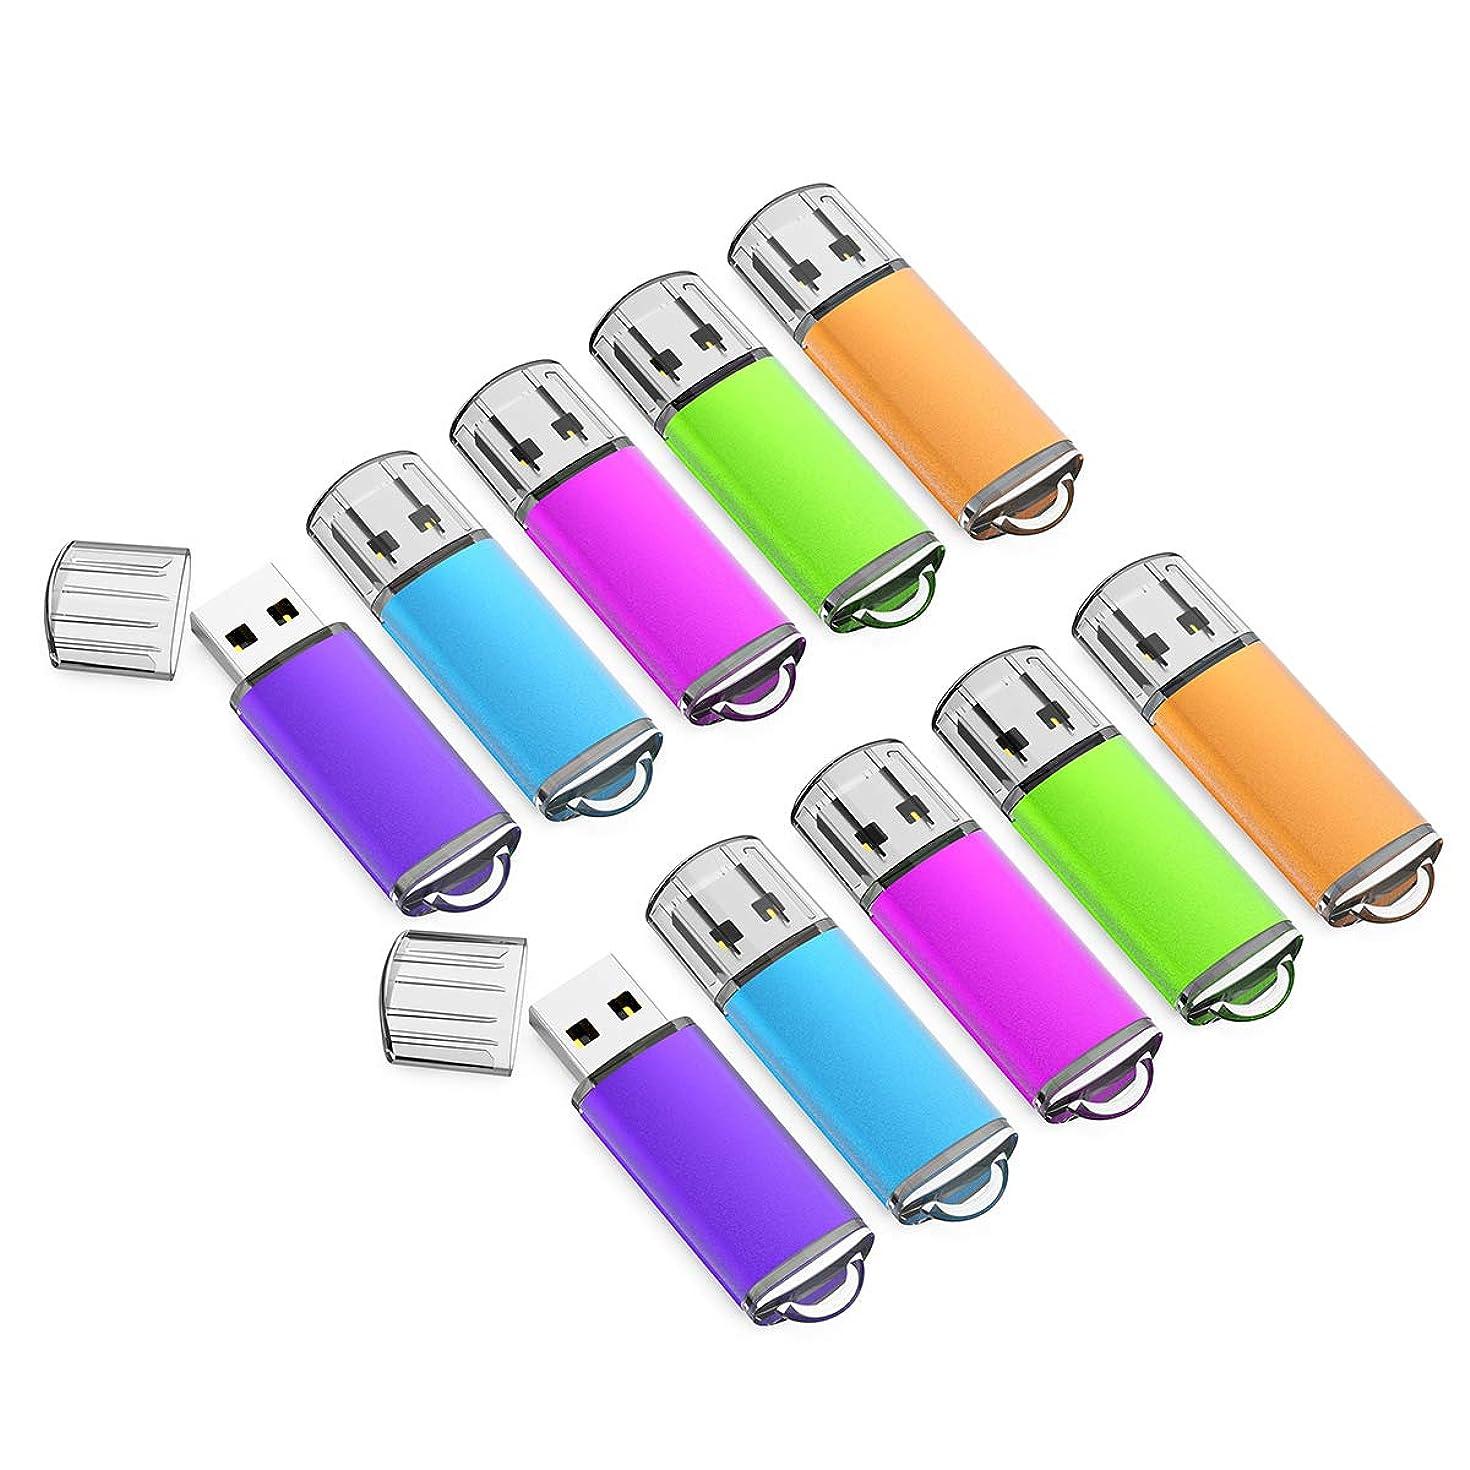 32GB USB Flash Drive 10 Pack with Easy-Storage Bag Memory Stick K&ZZ Thumb Drives Gig Stick USB2.0 Pen Drive for Fold Digital Data Storage, Zip Drive, Jump Drive, Flash Stick, Mixed Colors